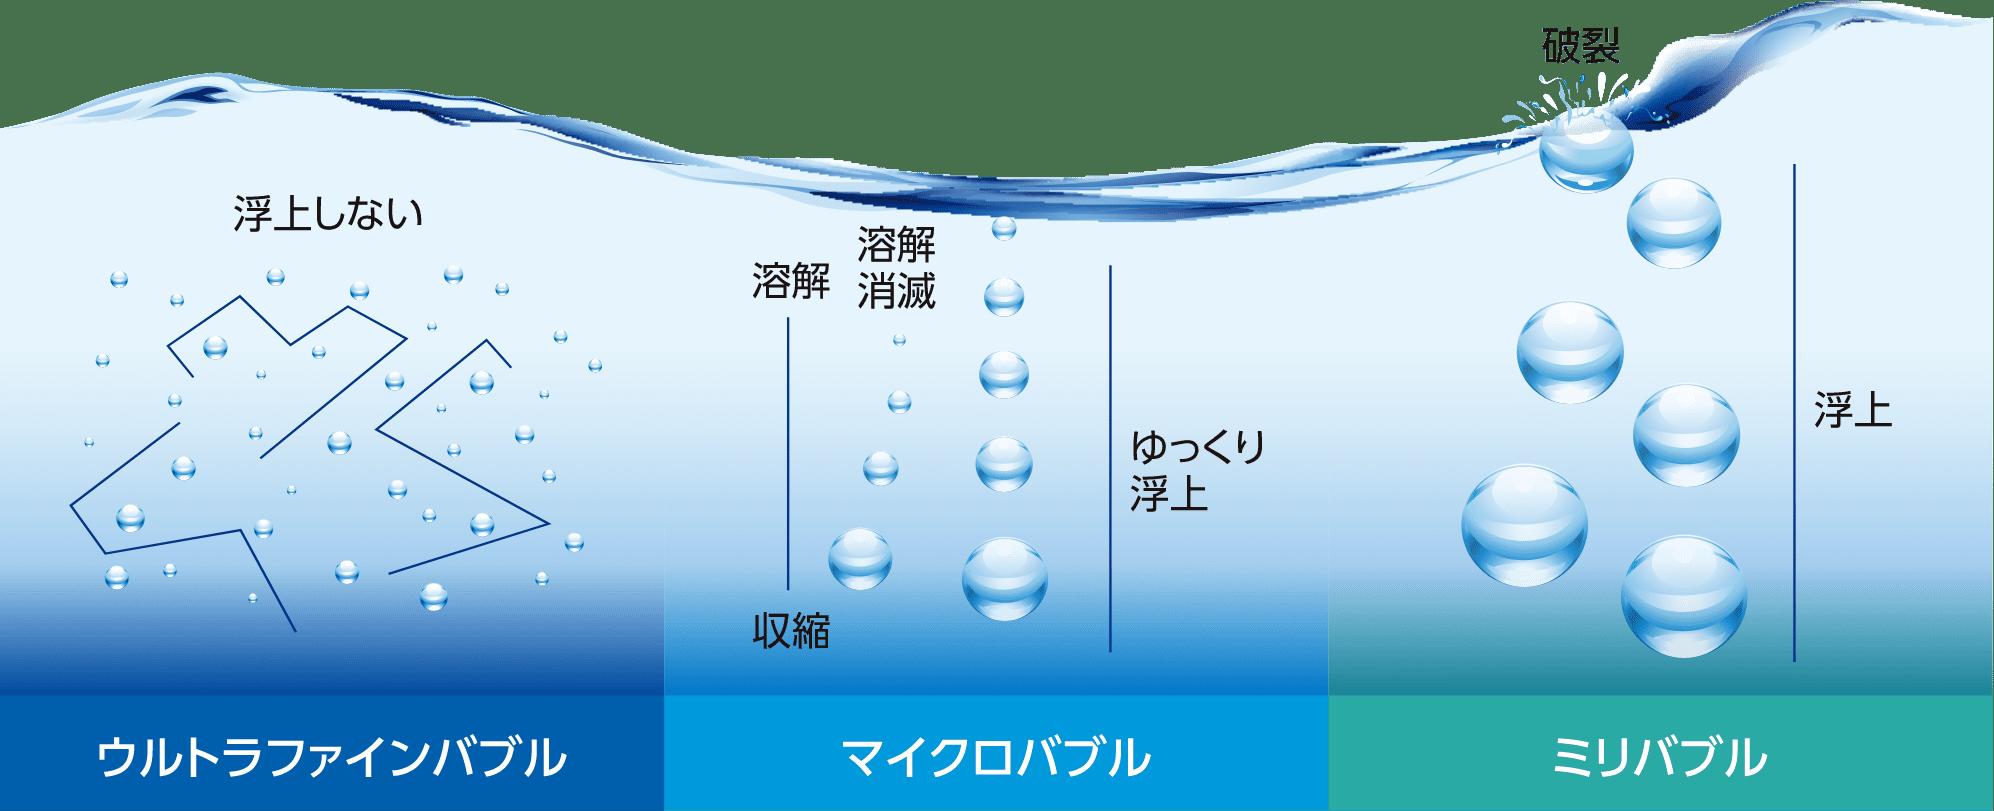 About Ultra Fine Bubble